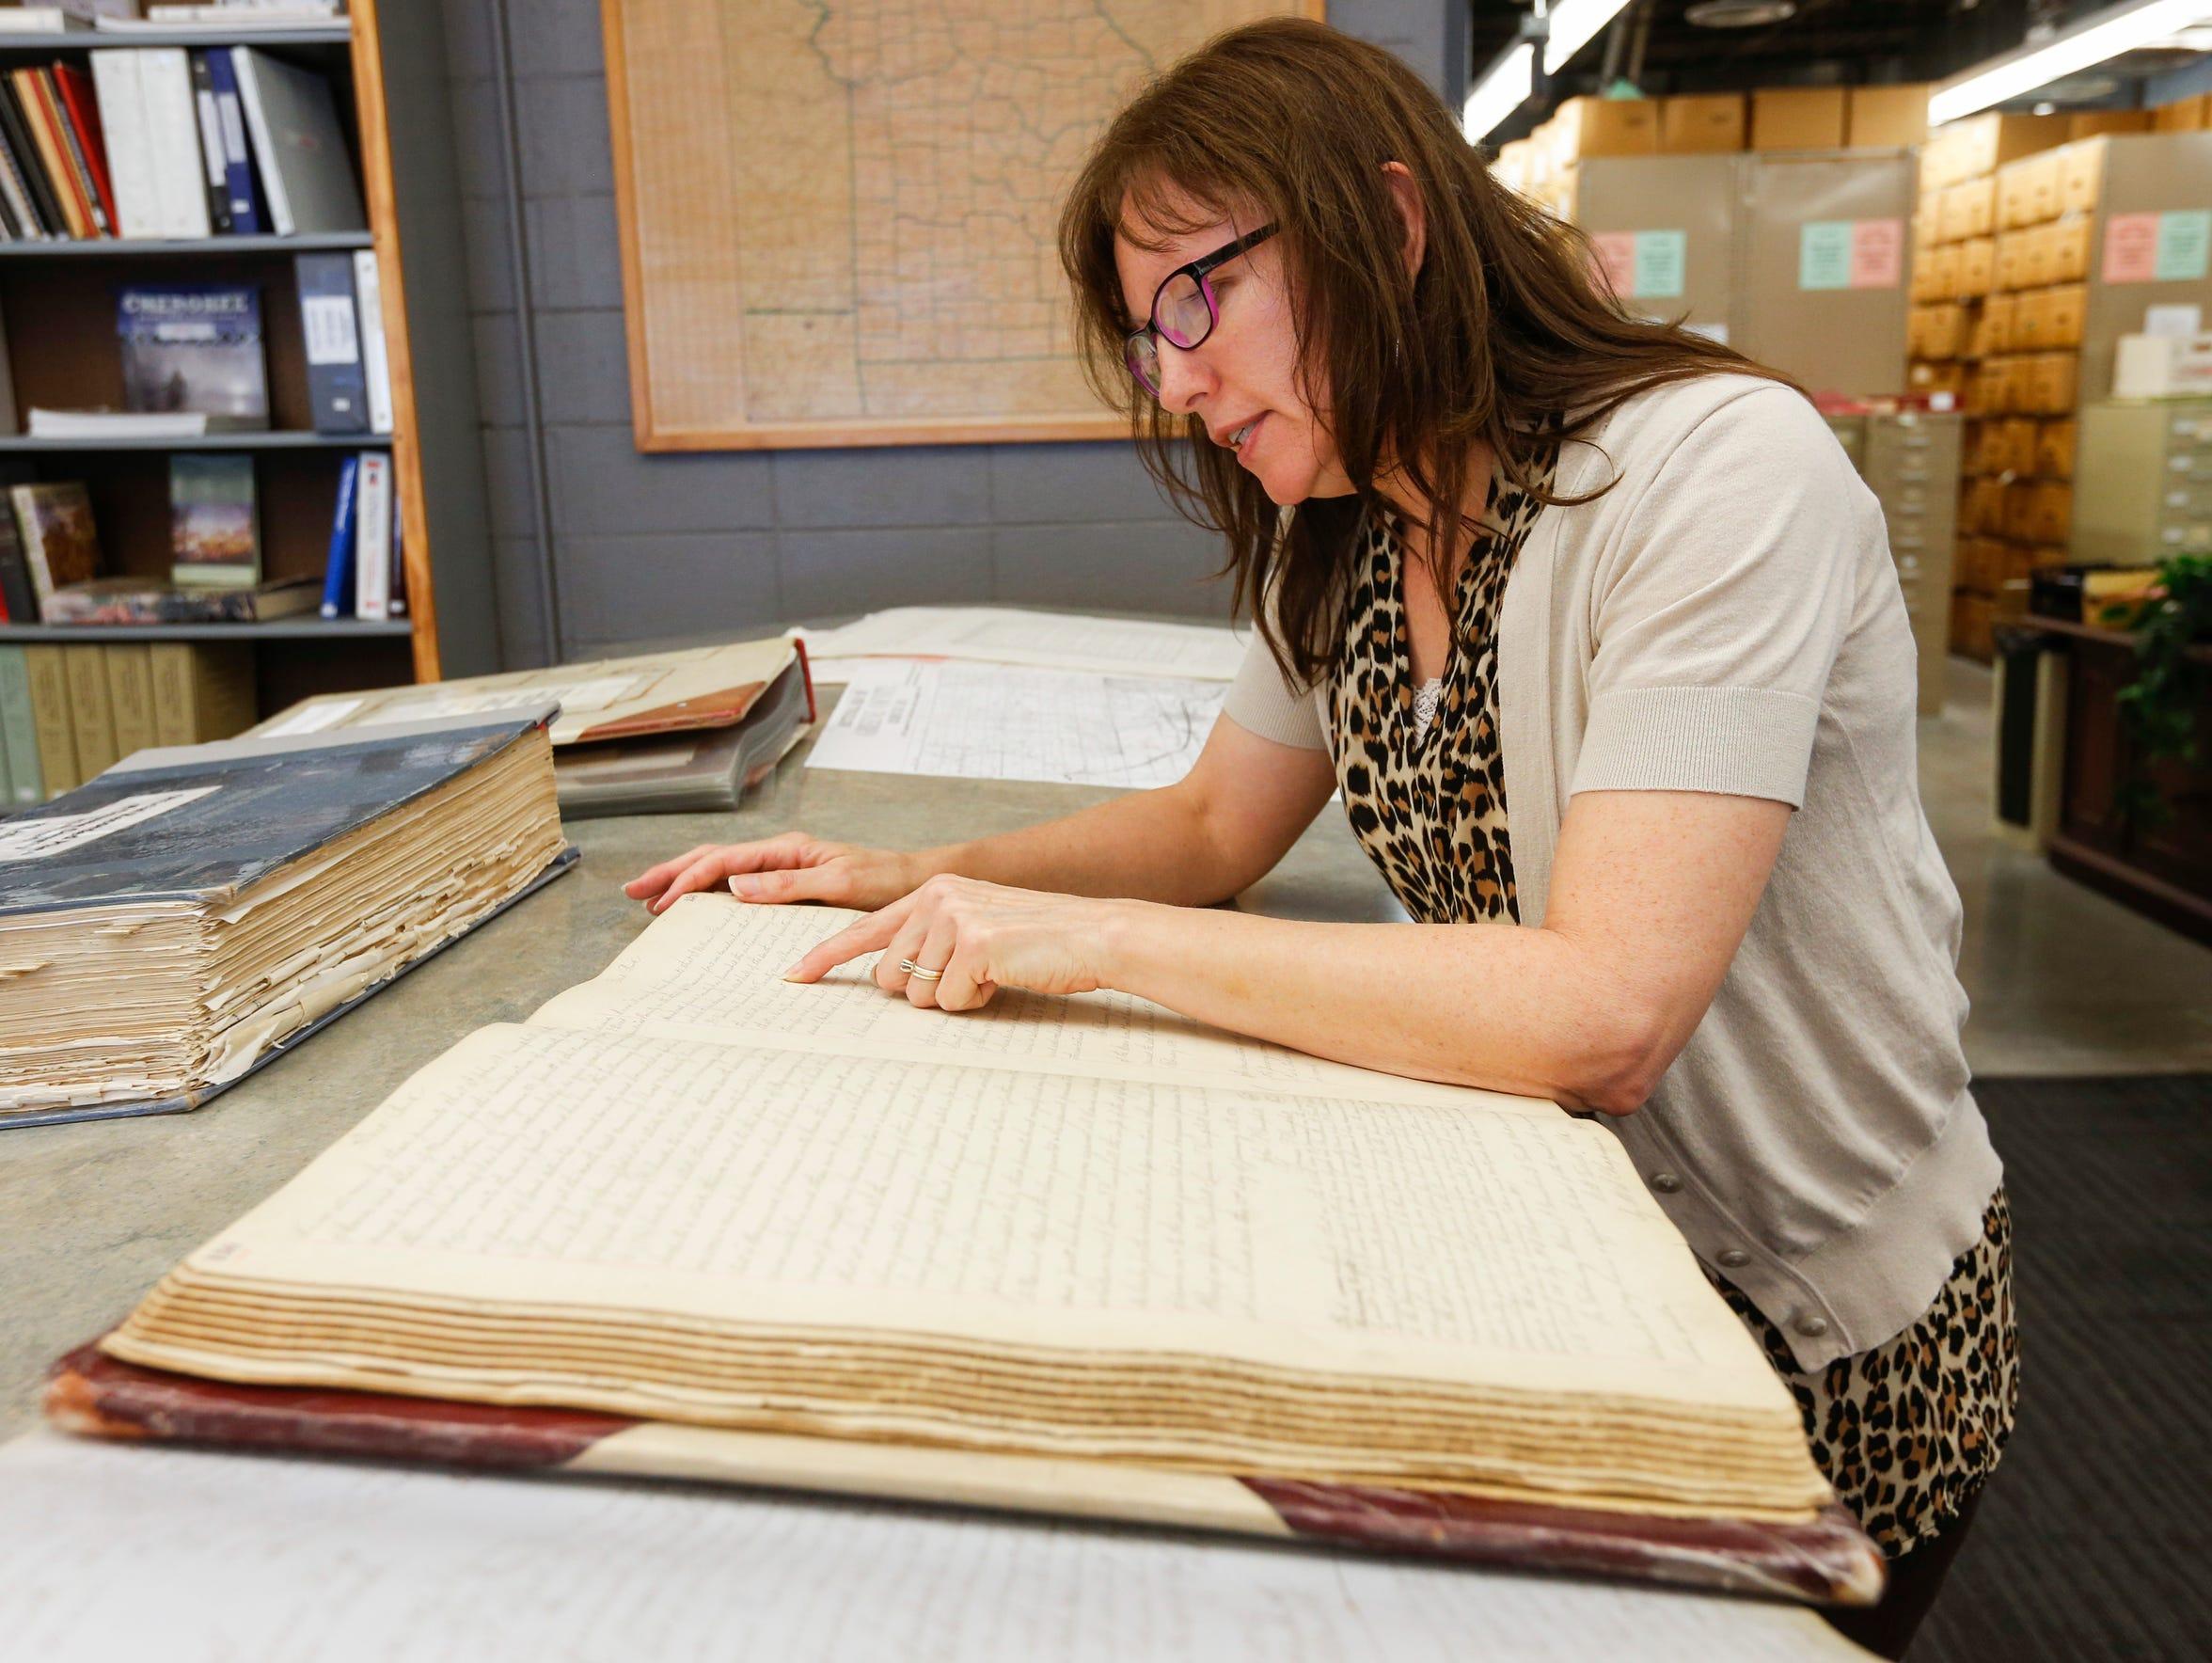 Archivist Connie Yen looks through documents while